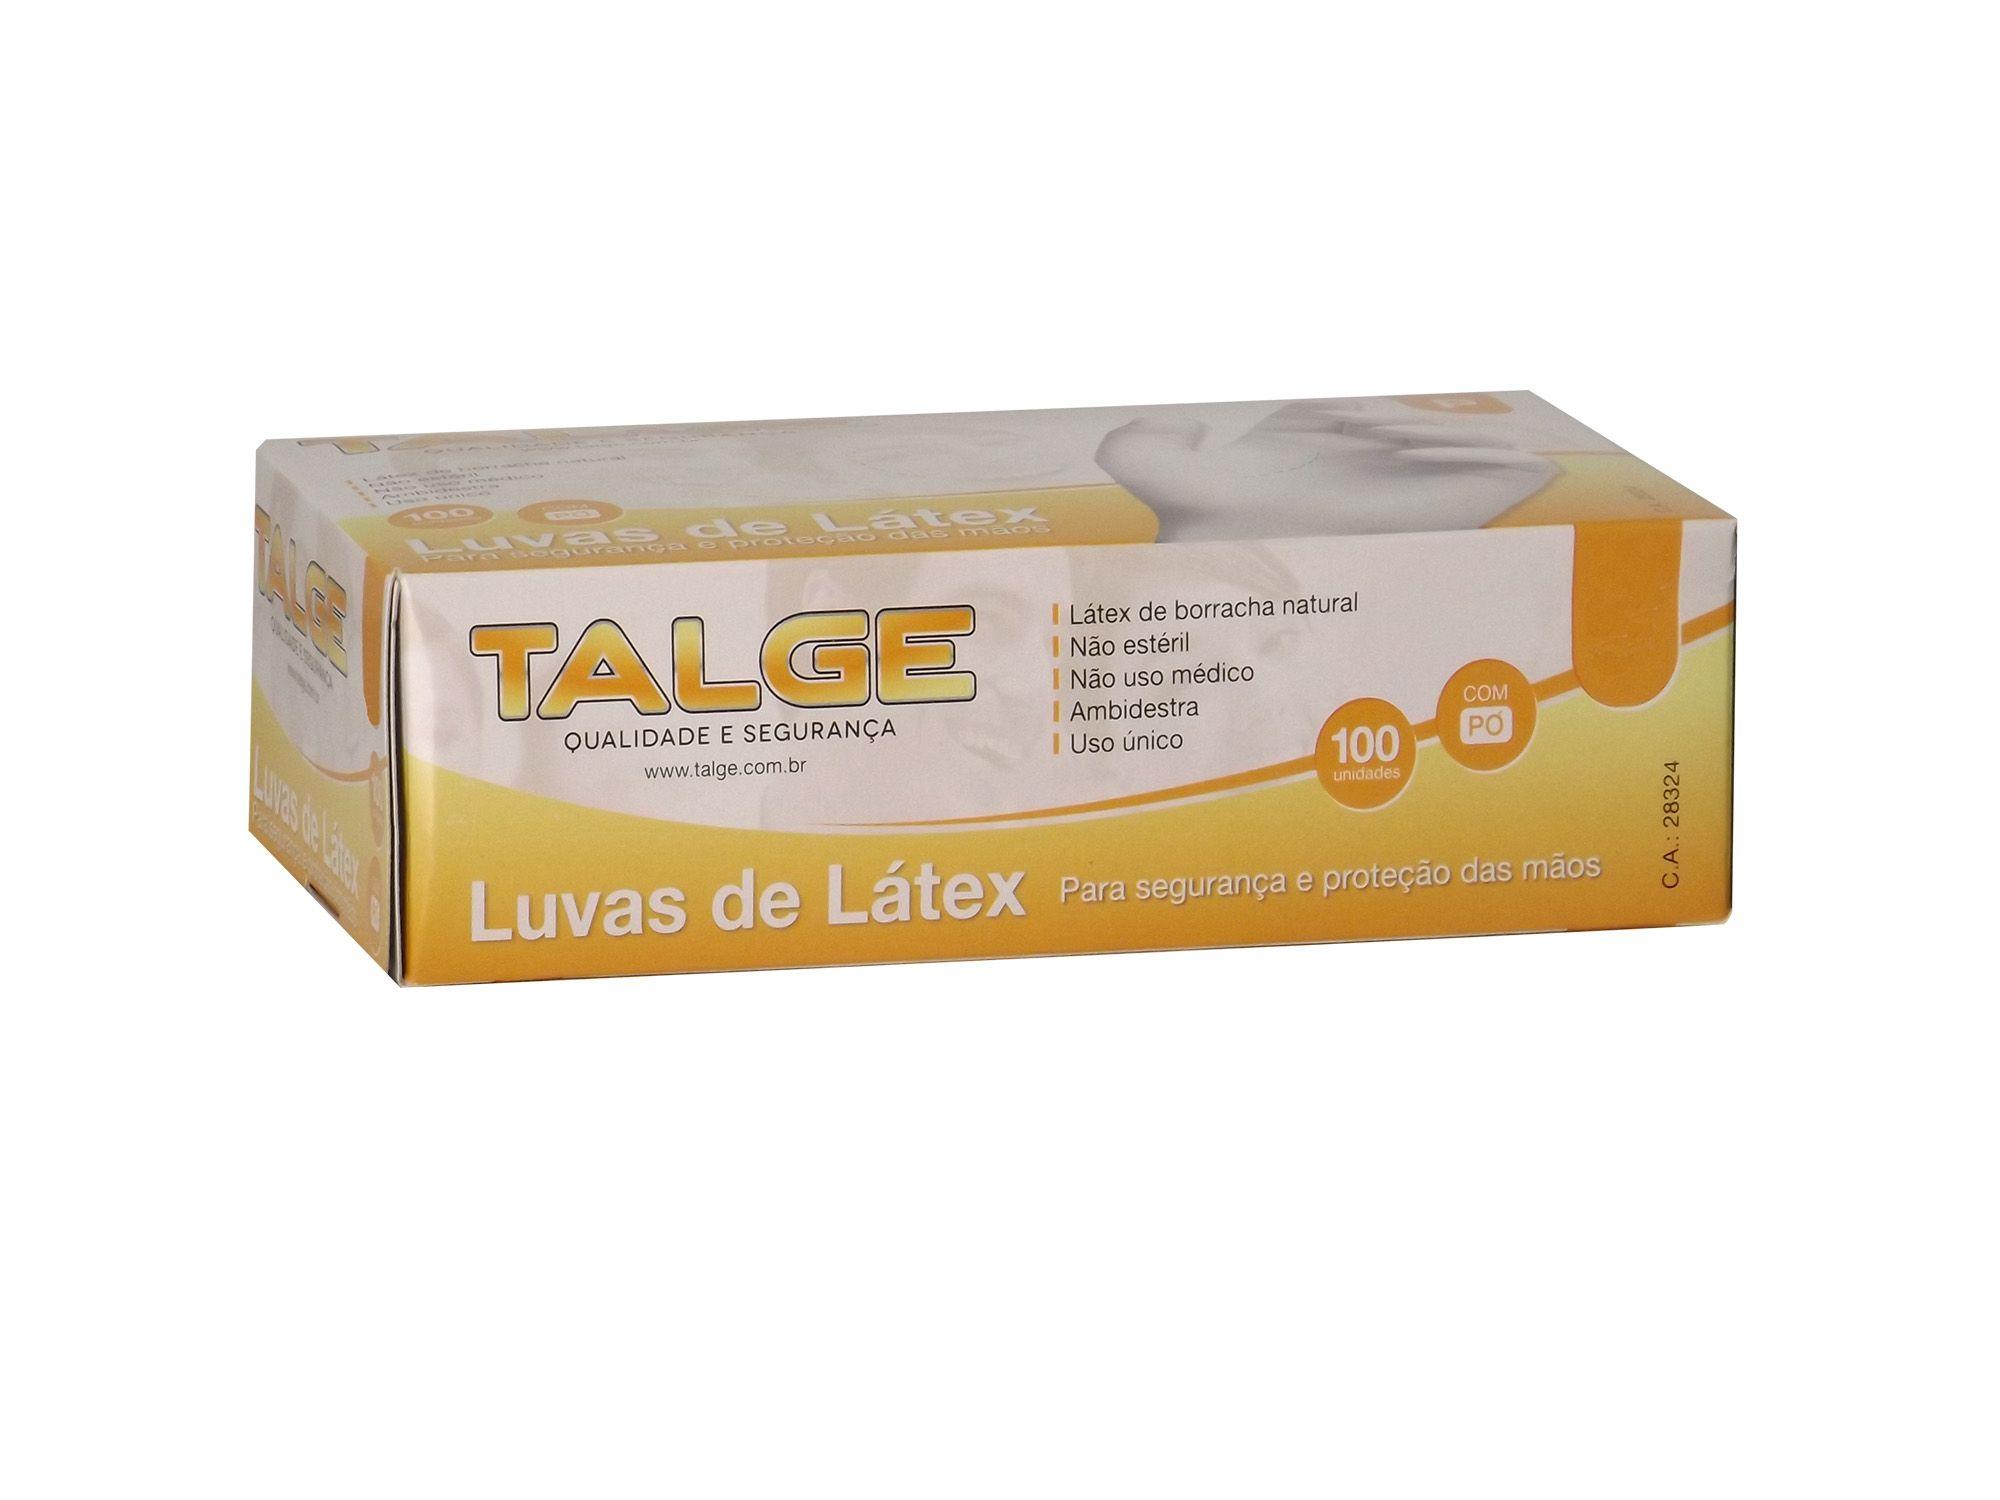 Luvas de Látex com Pó C/100 Unid.